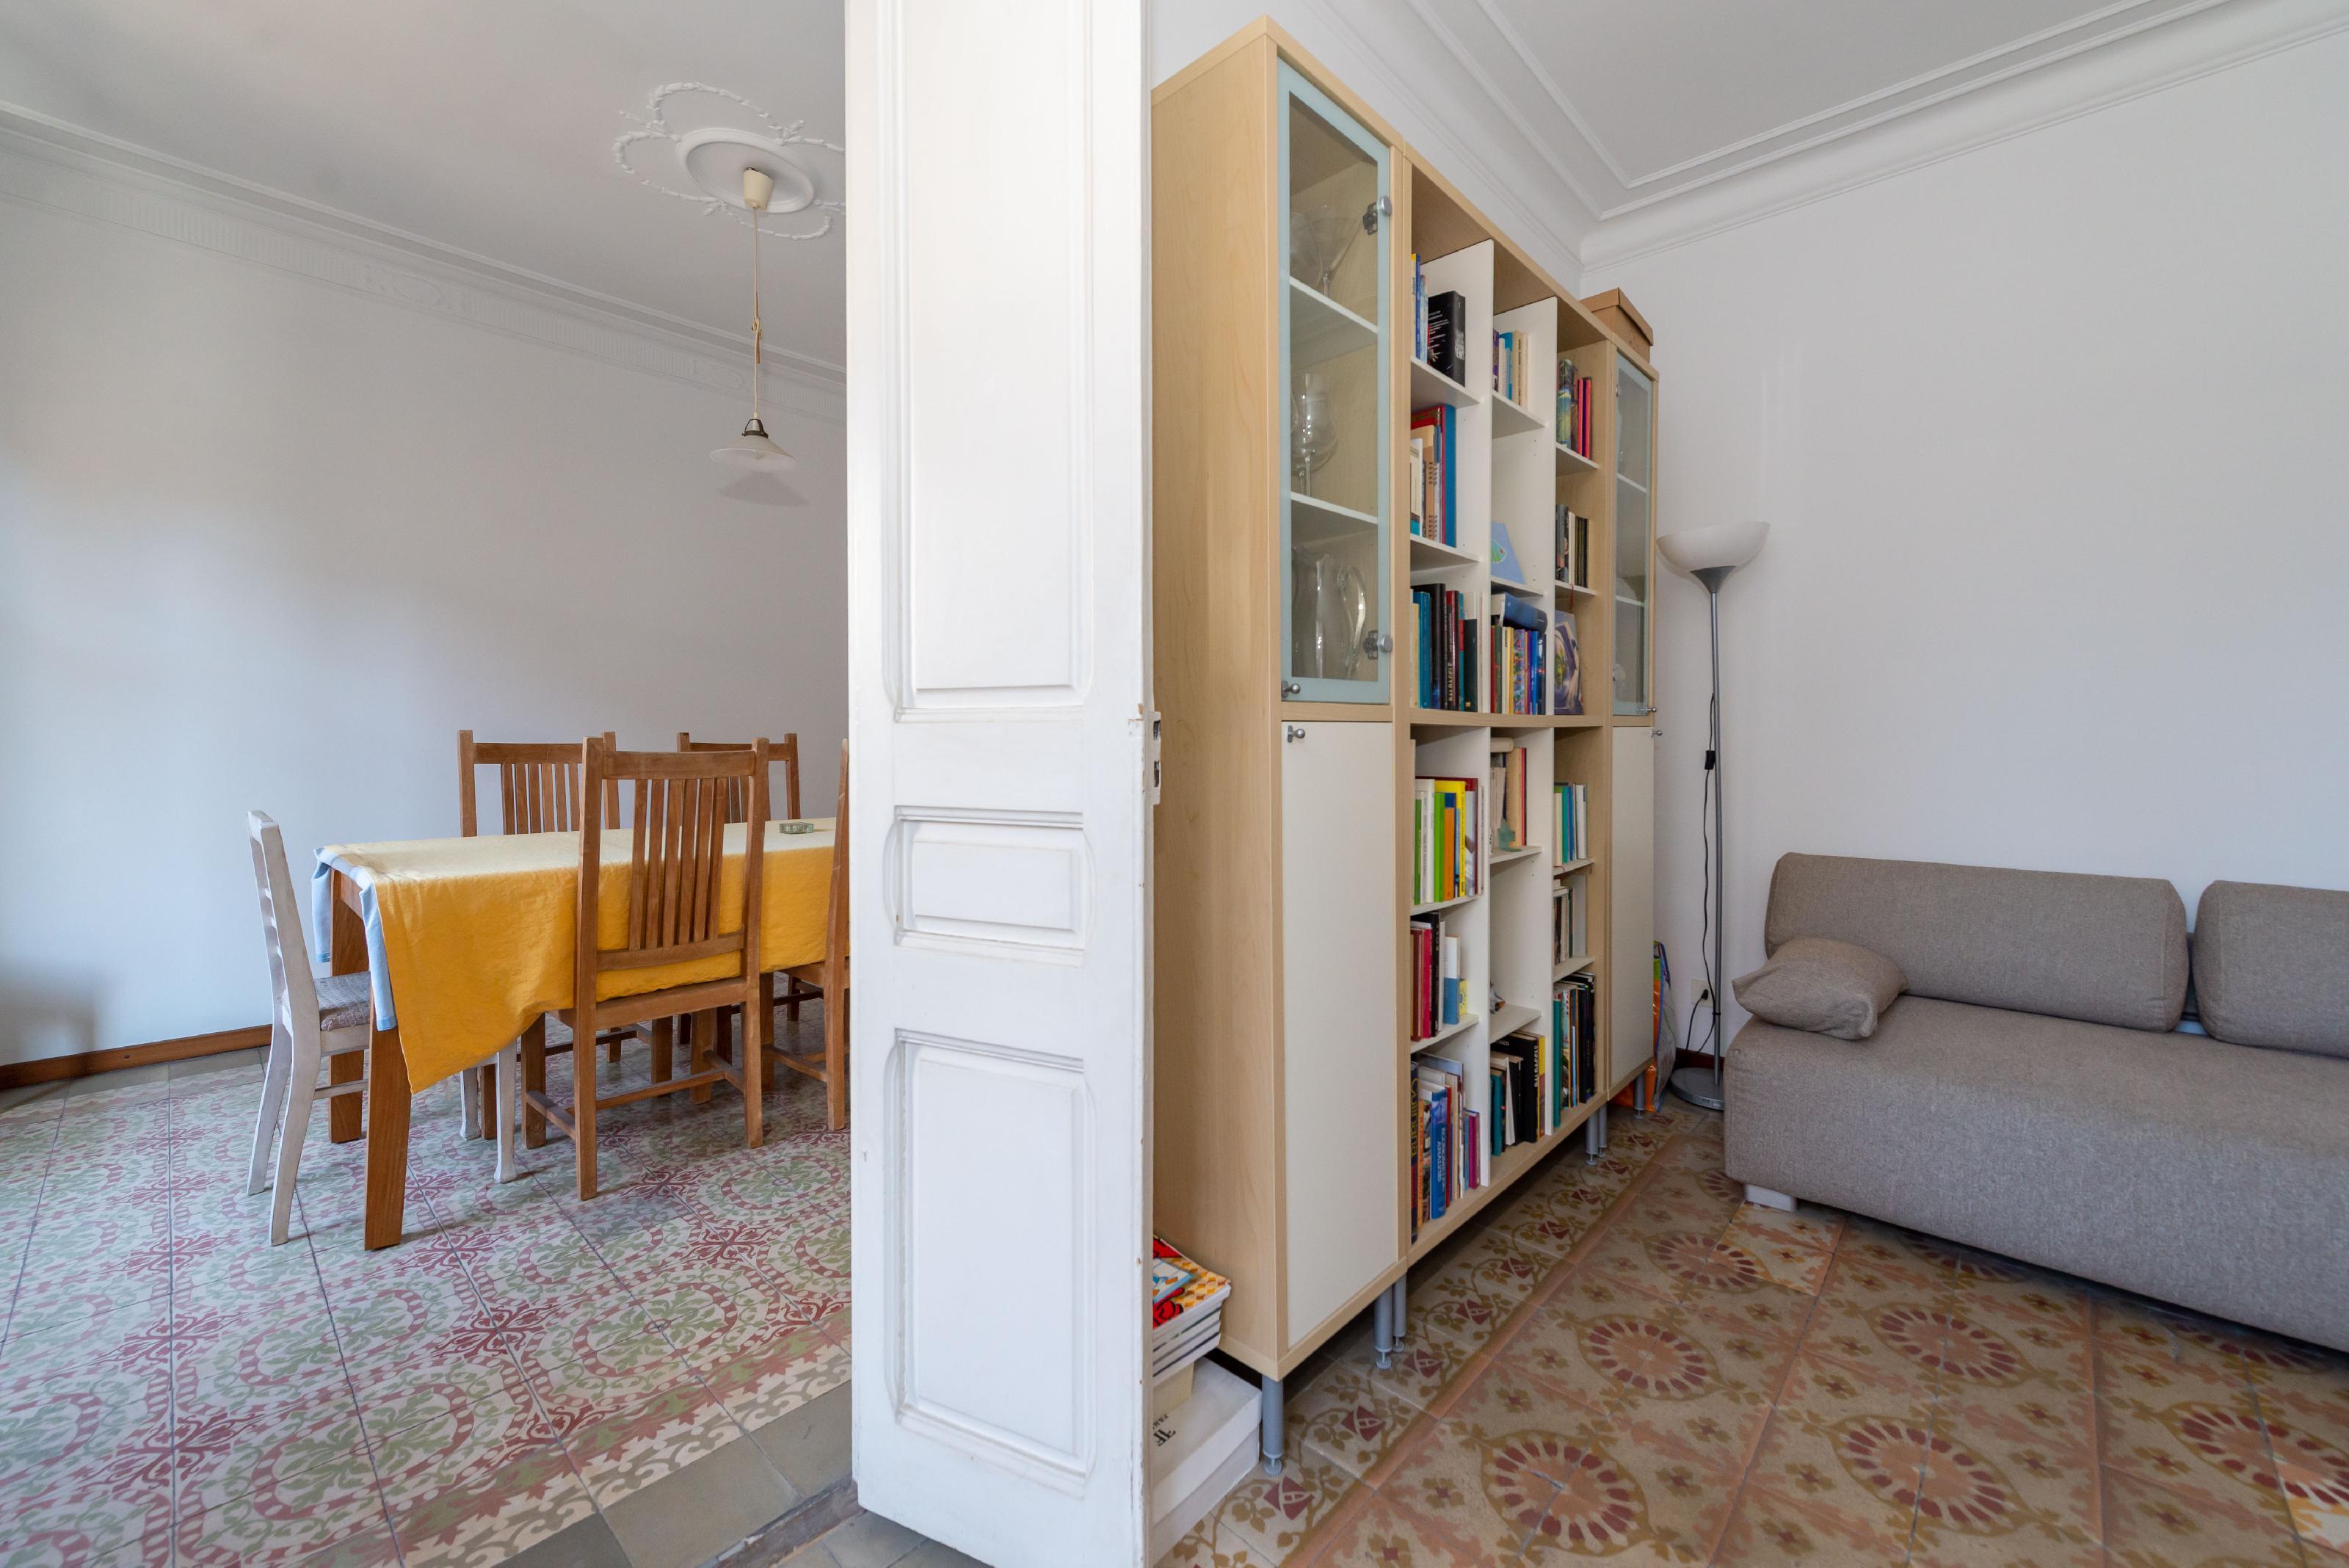 250582 Flat for sale in Sarrià-Sant Gervasi, Sant Gervasi-Galvany 8